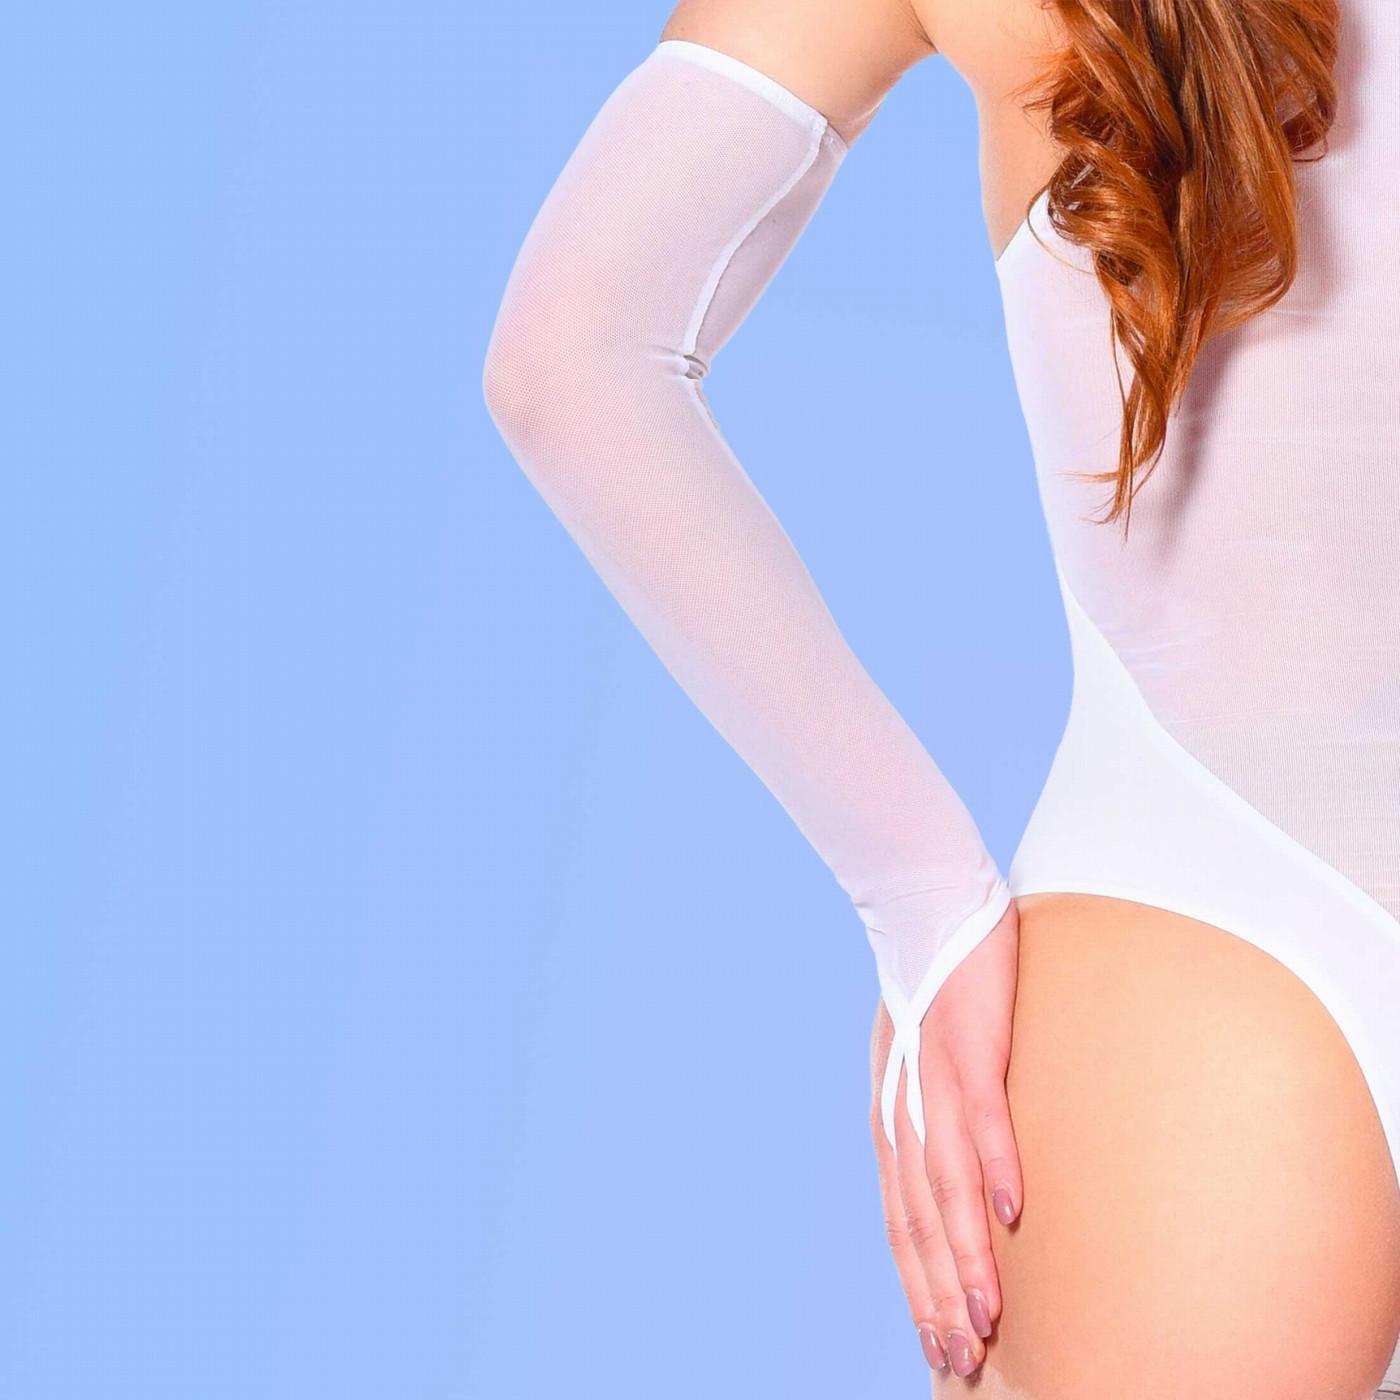 Mitaines sexy en résille blanche - Patrice Catanzaro